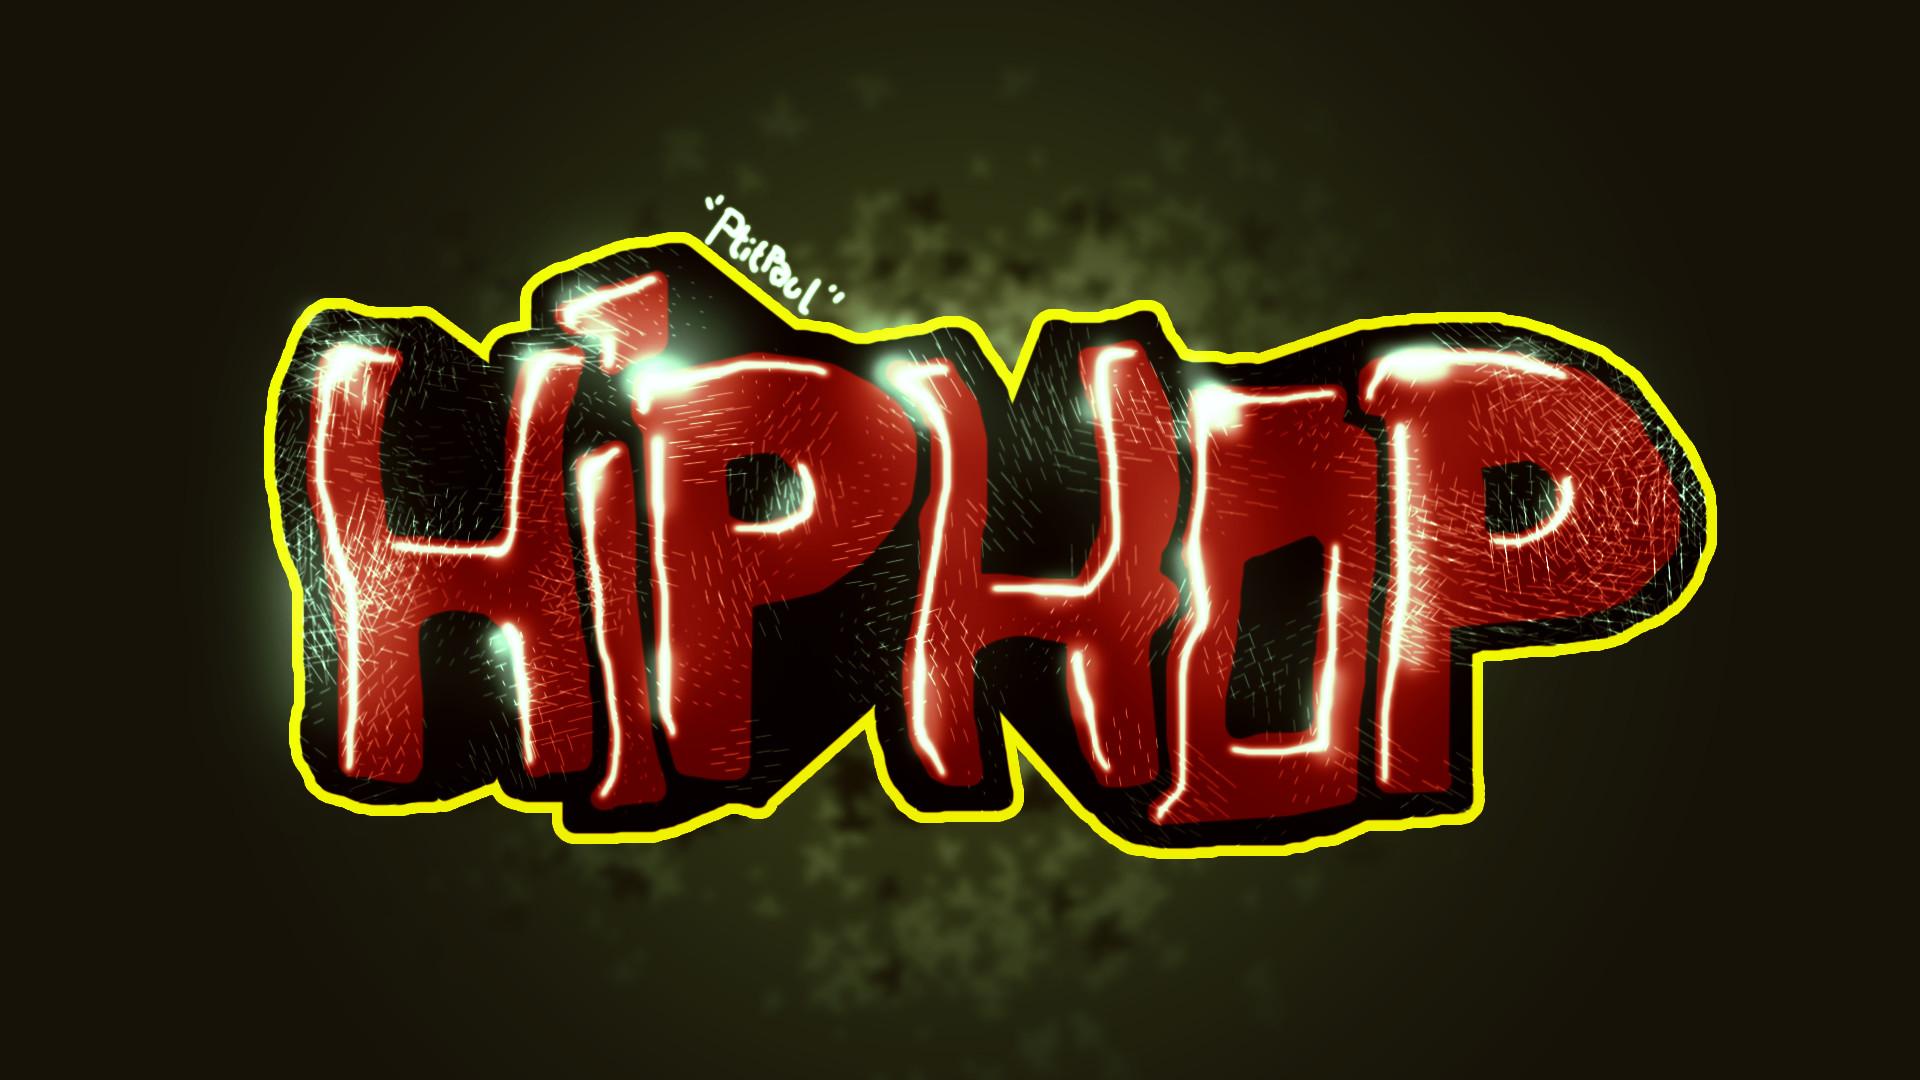 Music Graffiti Wallpapers: Hip Hop Graffiti Wallpaper (55+ Images